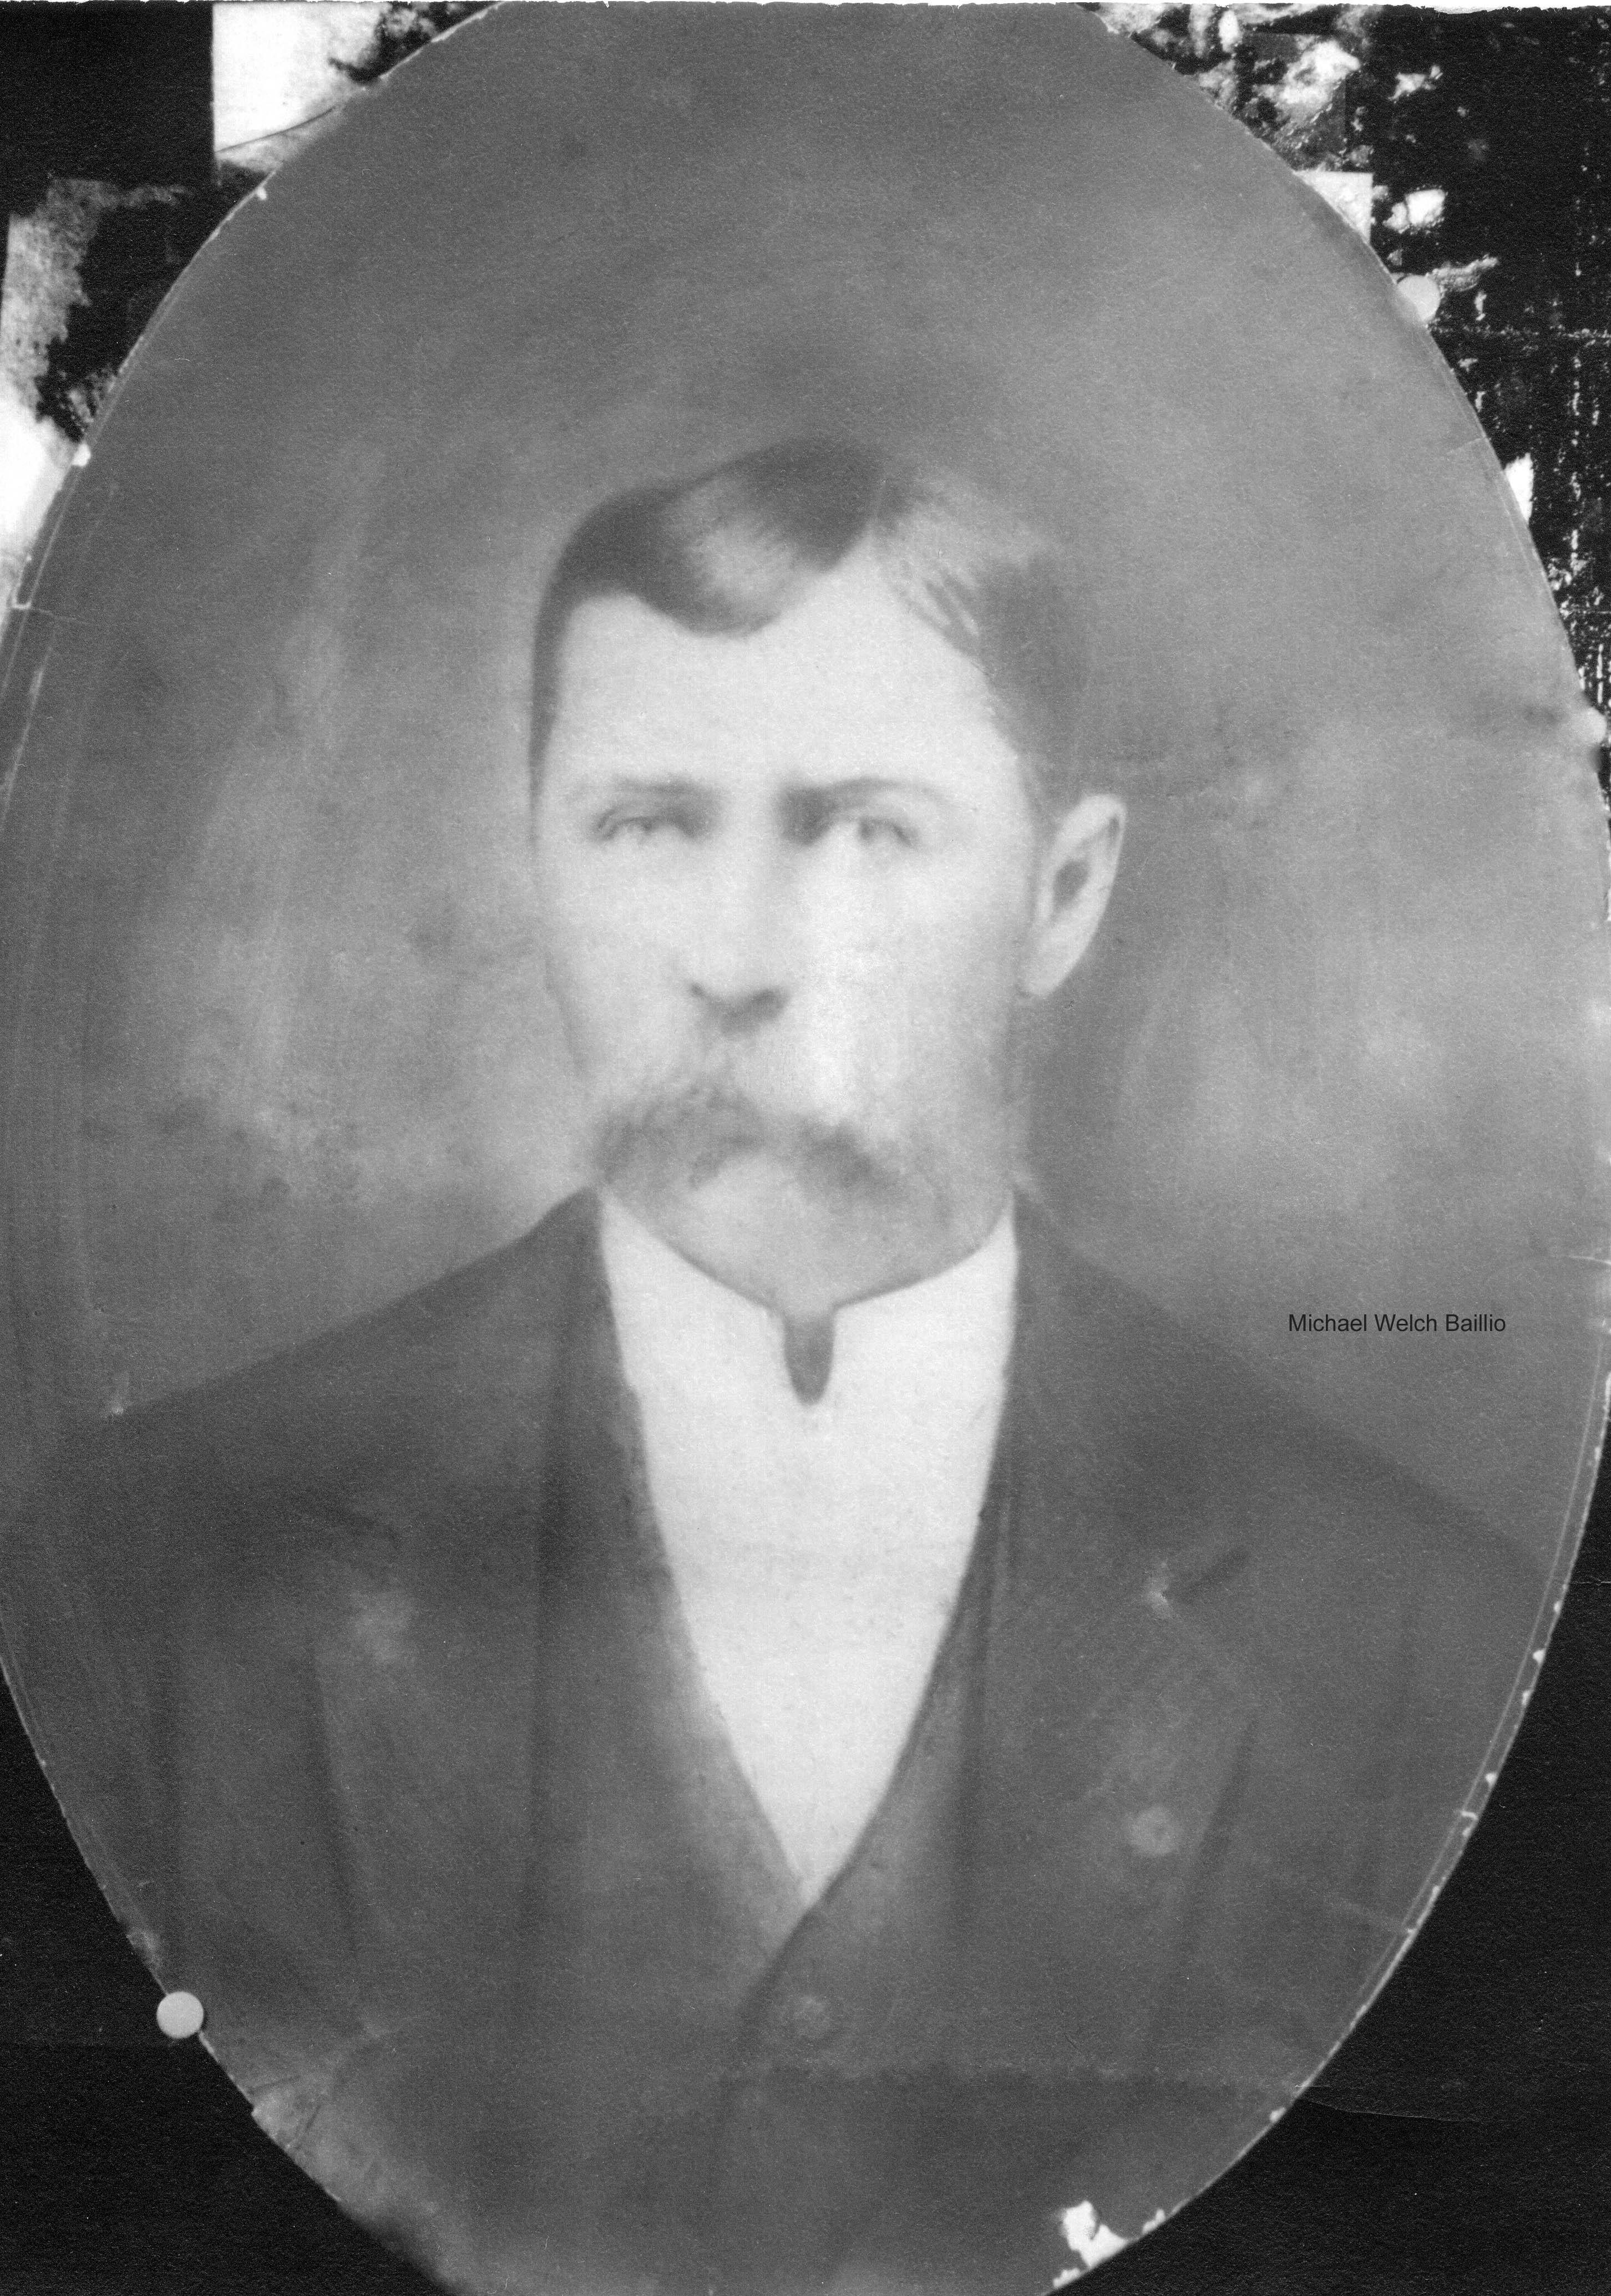 Constable Michael Welch Baillio | Rapides Parish Constable's Office, Louisiana